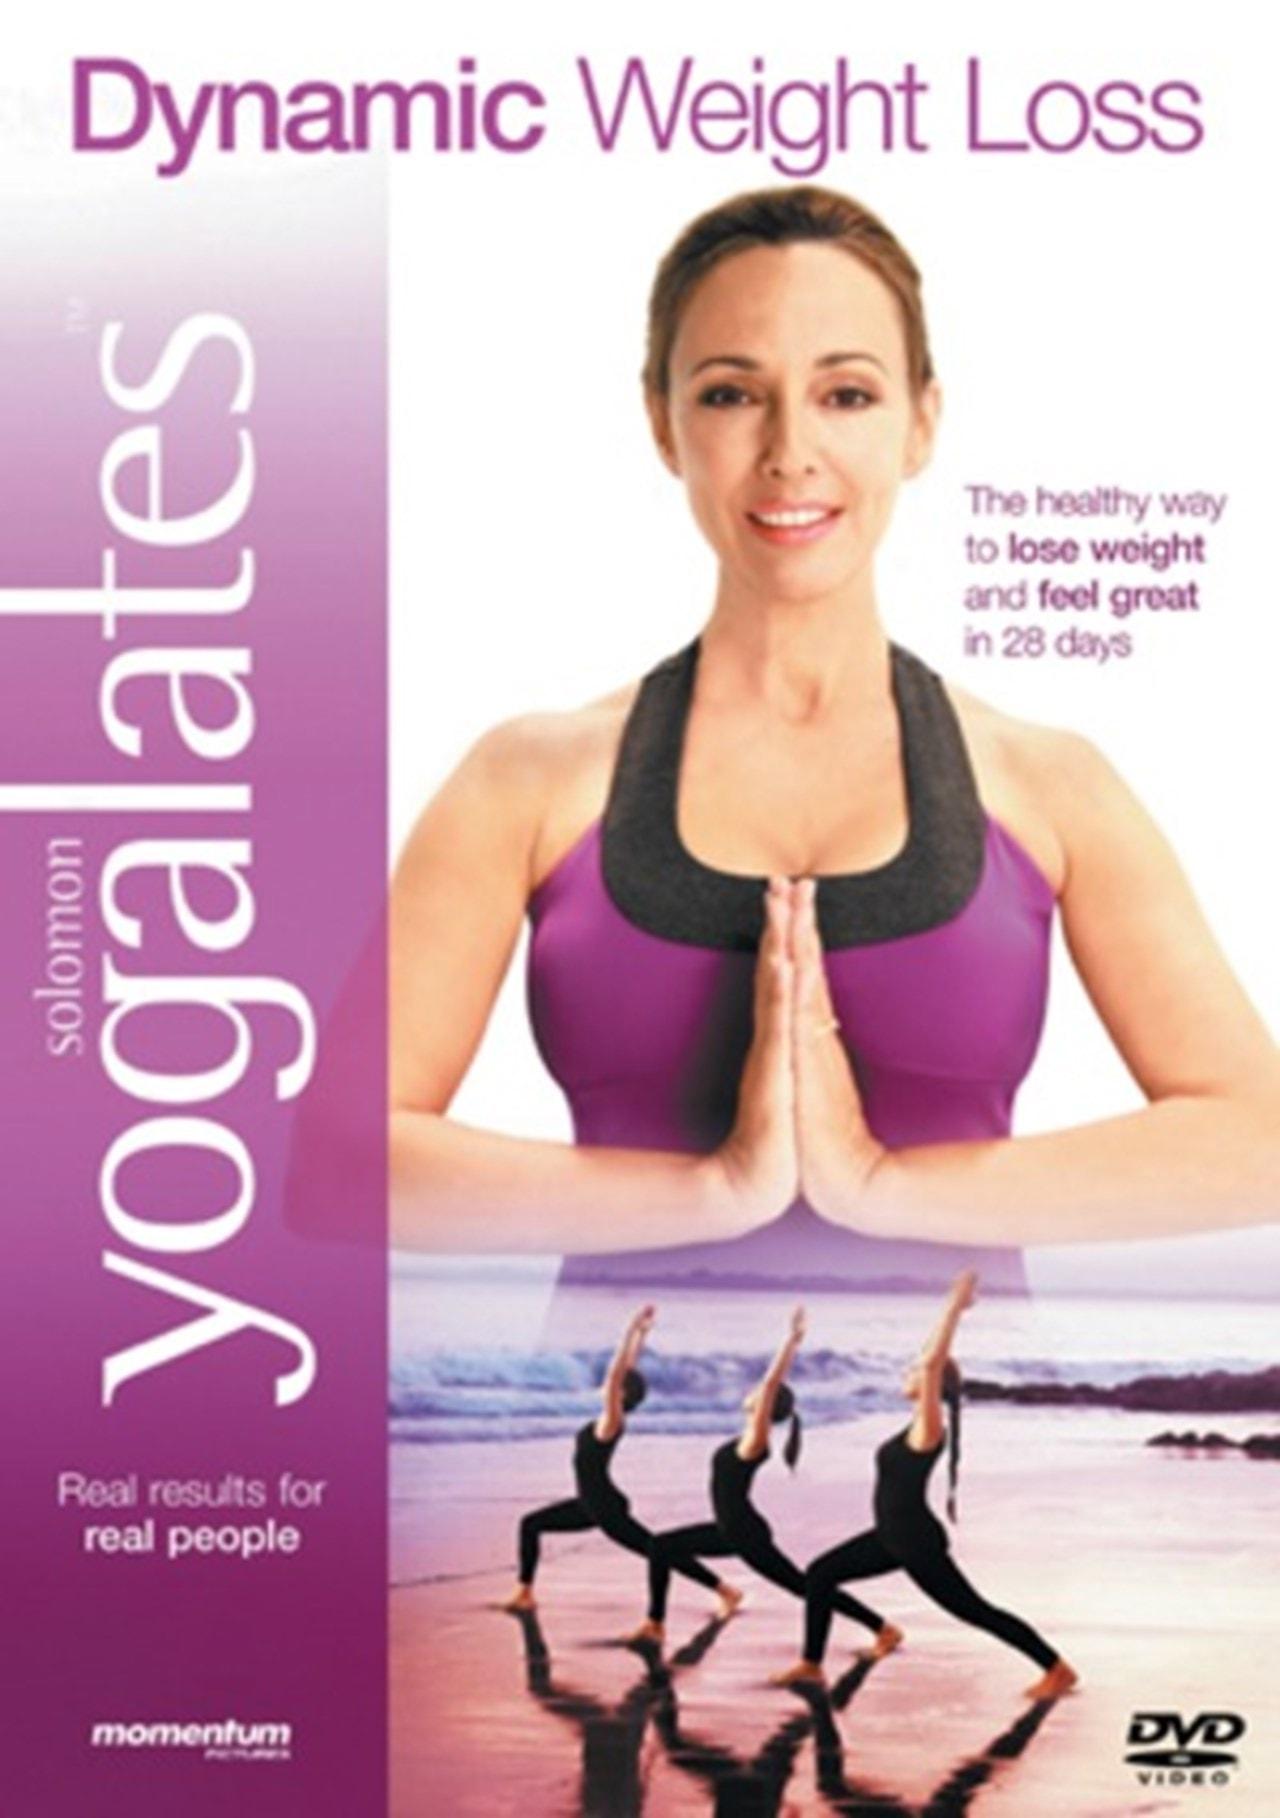 Yogalates: 8 - Dynamic Weight Loss - 1